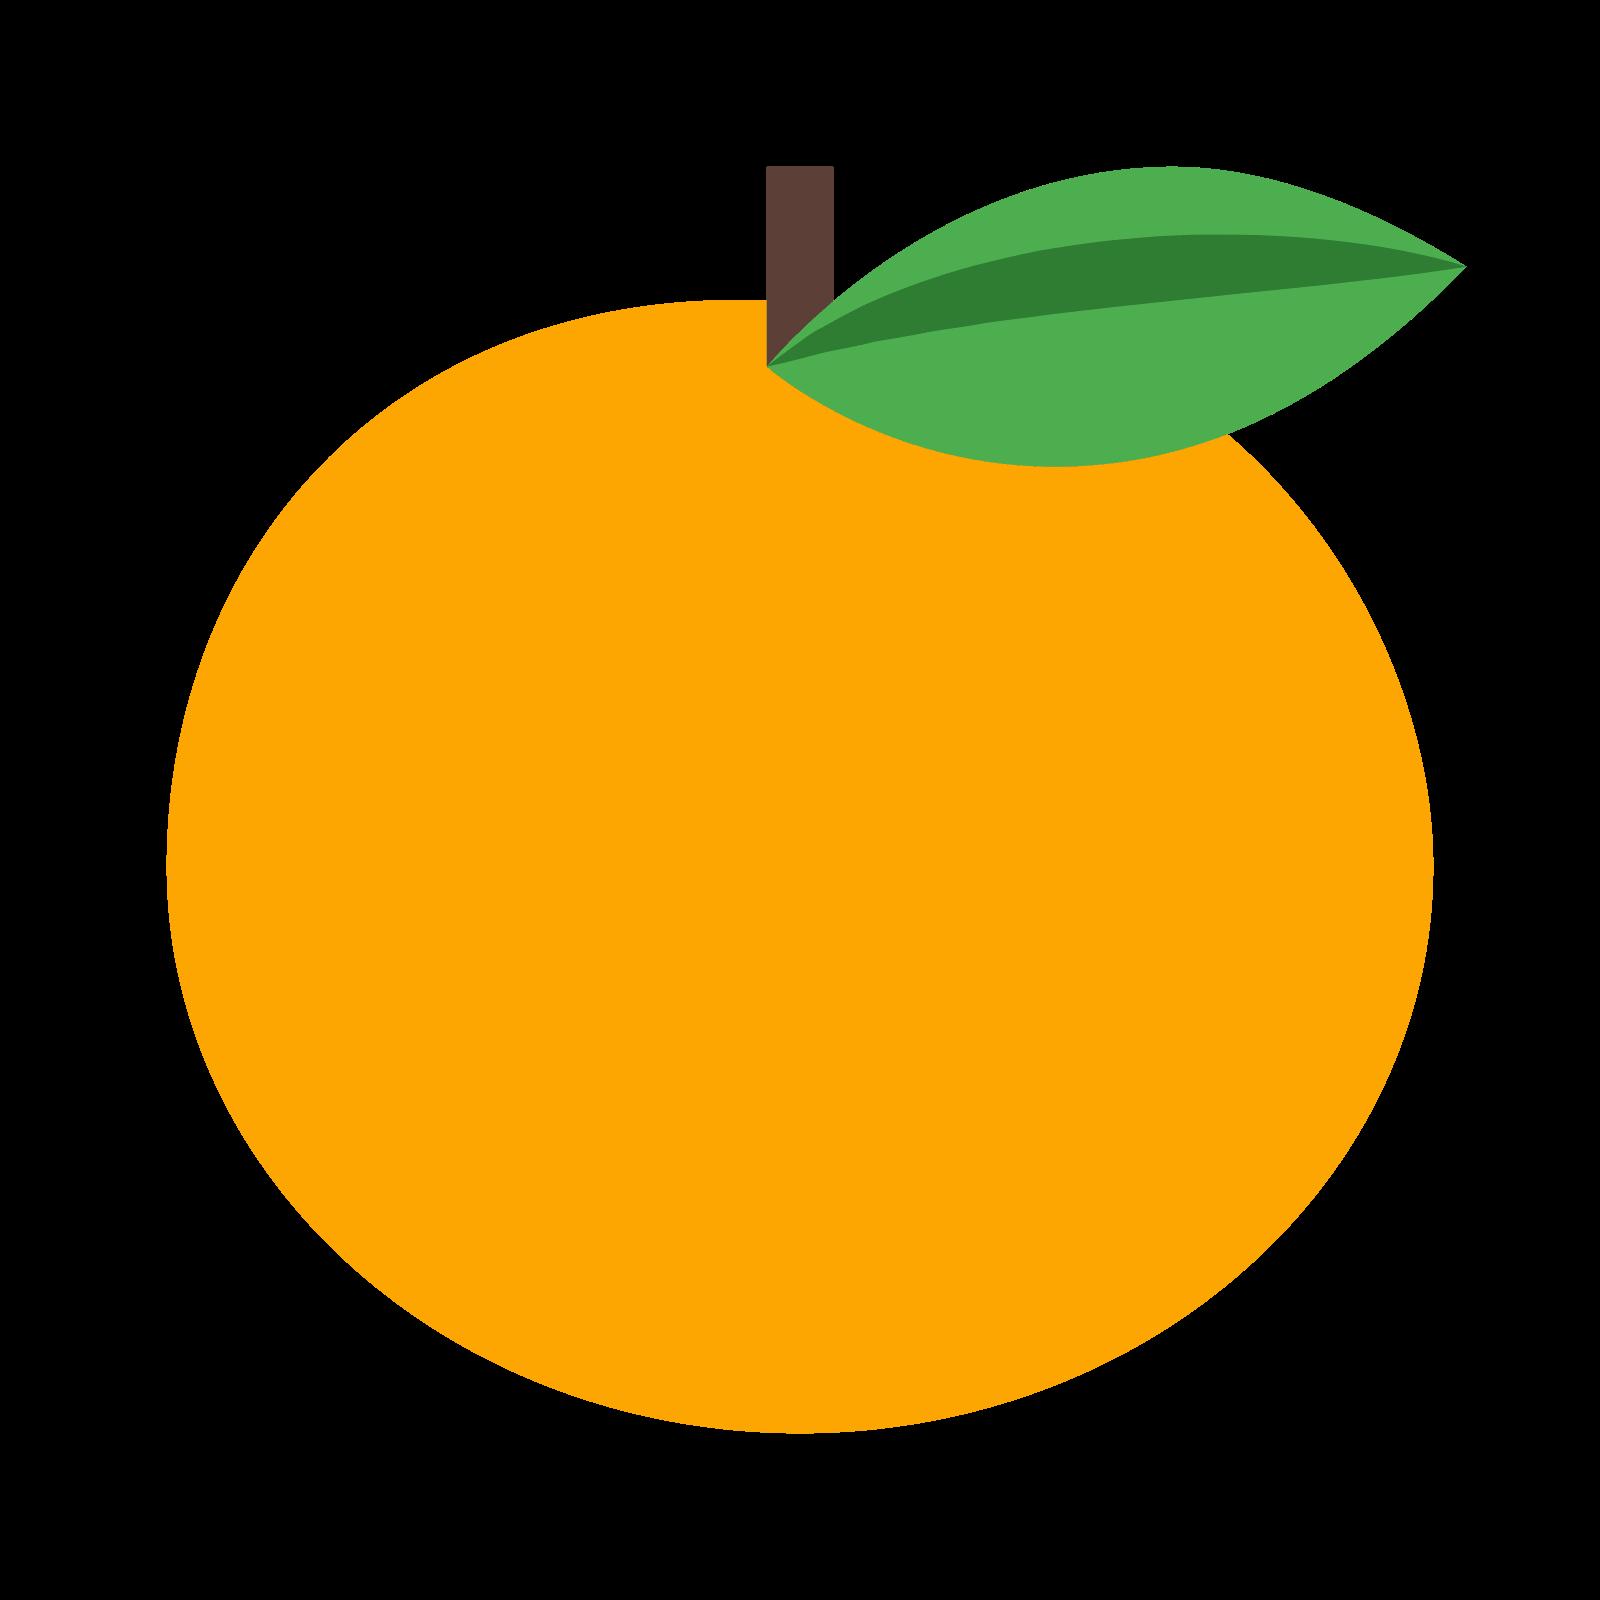 Icon Orange #352152.